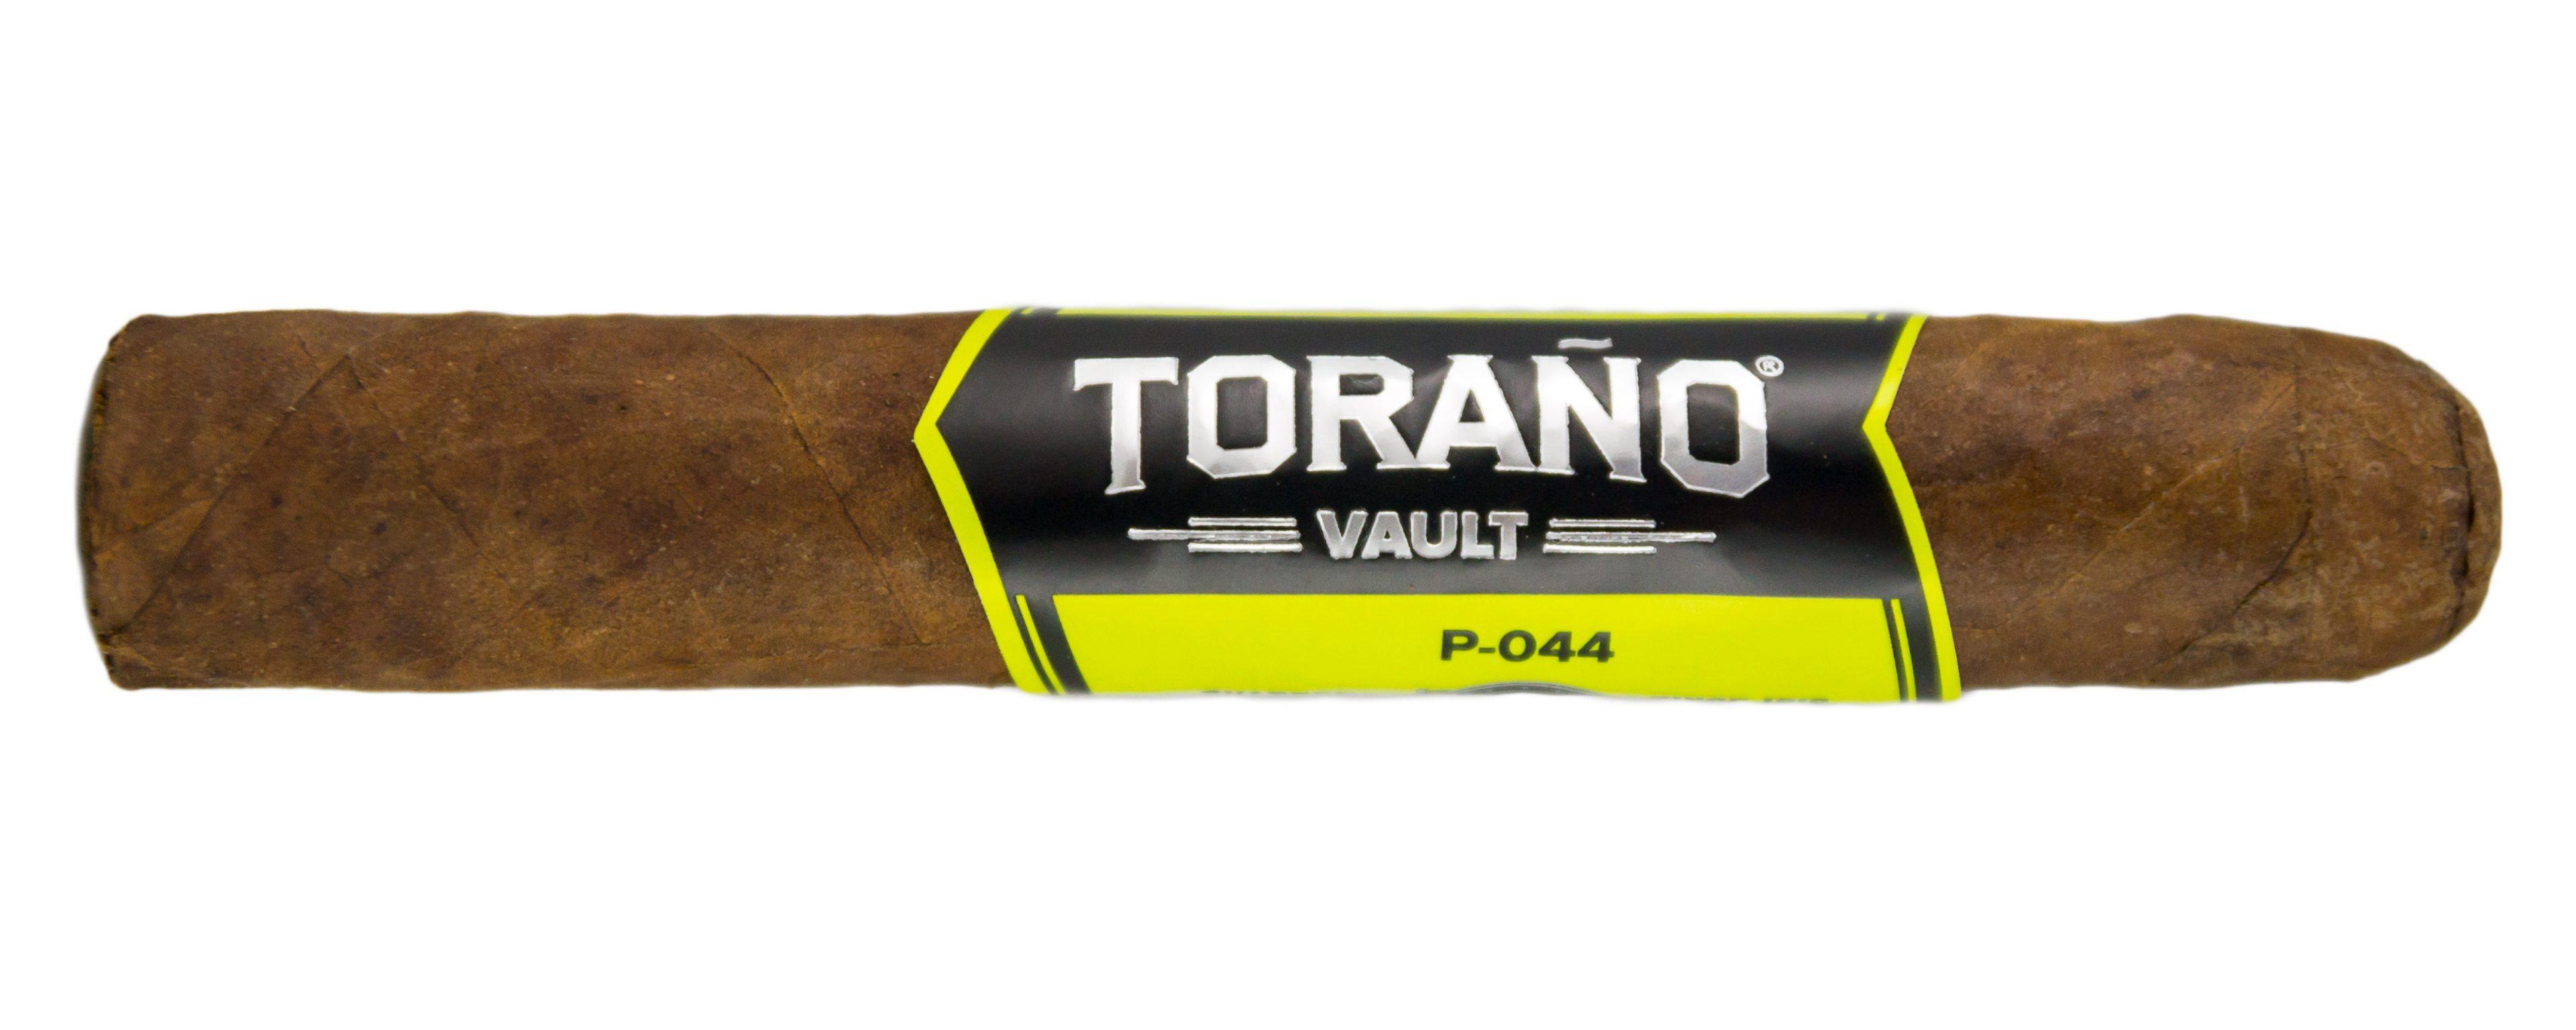 Blind Cigar Review: Carlos Torano | Vault P-044 Robusto